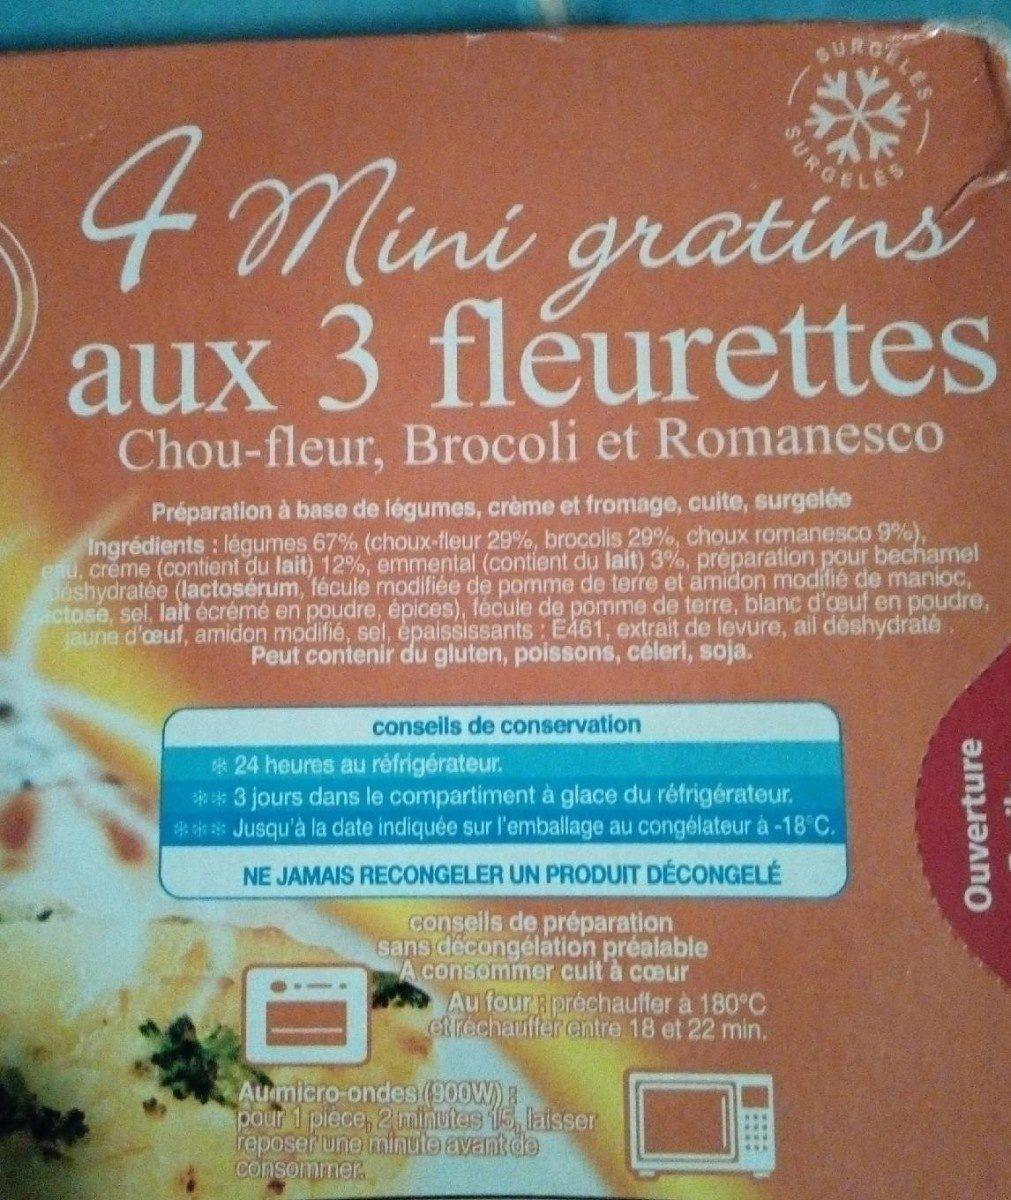 4 mini gratins aux 3 fleurettes - Inhaltsstoffe - fr